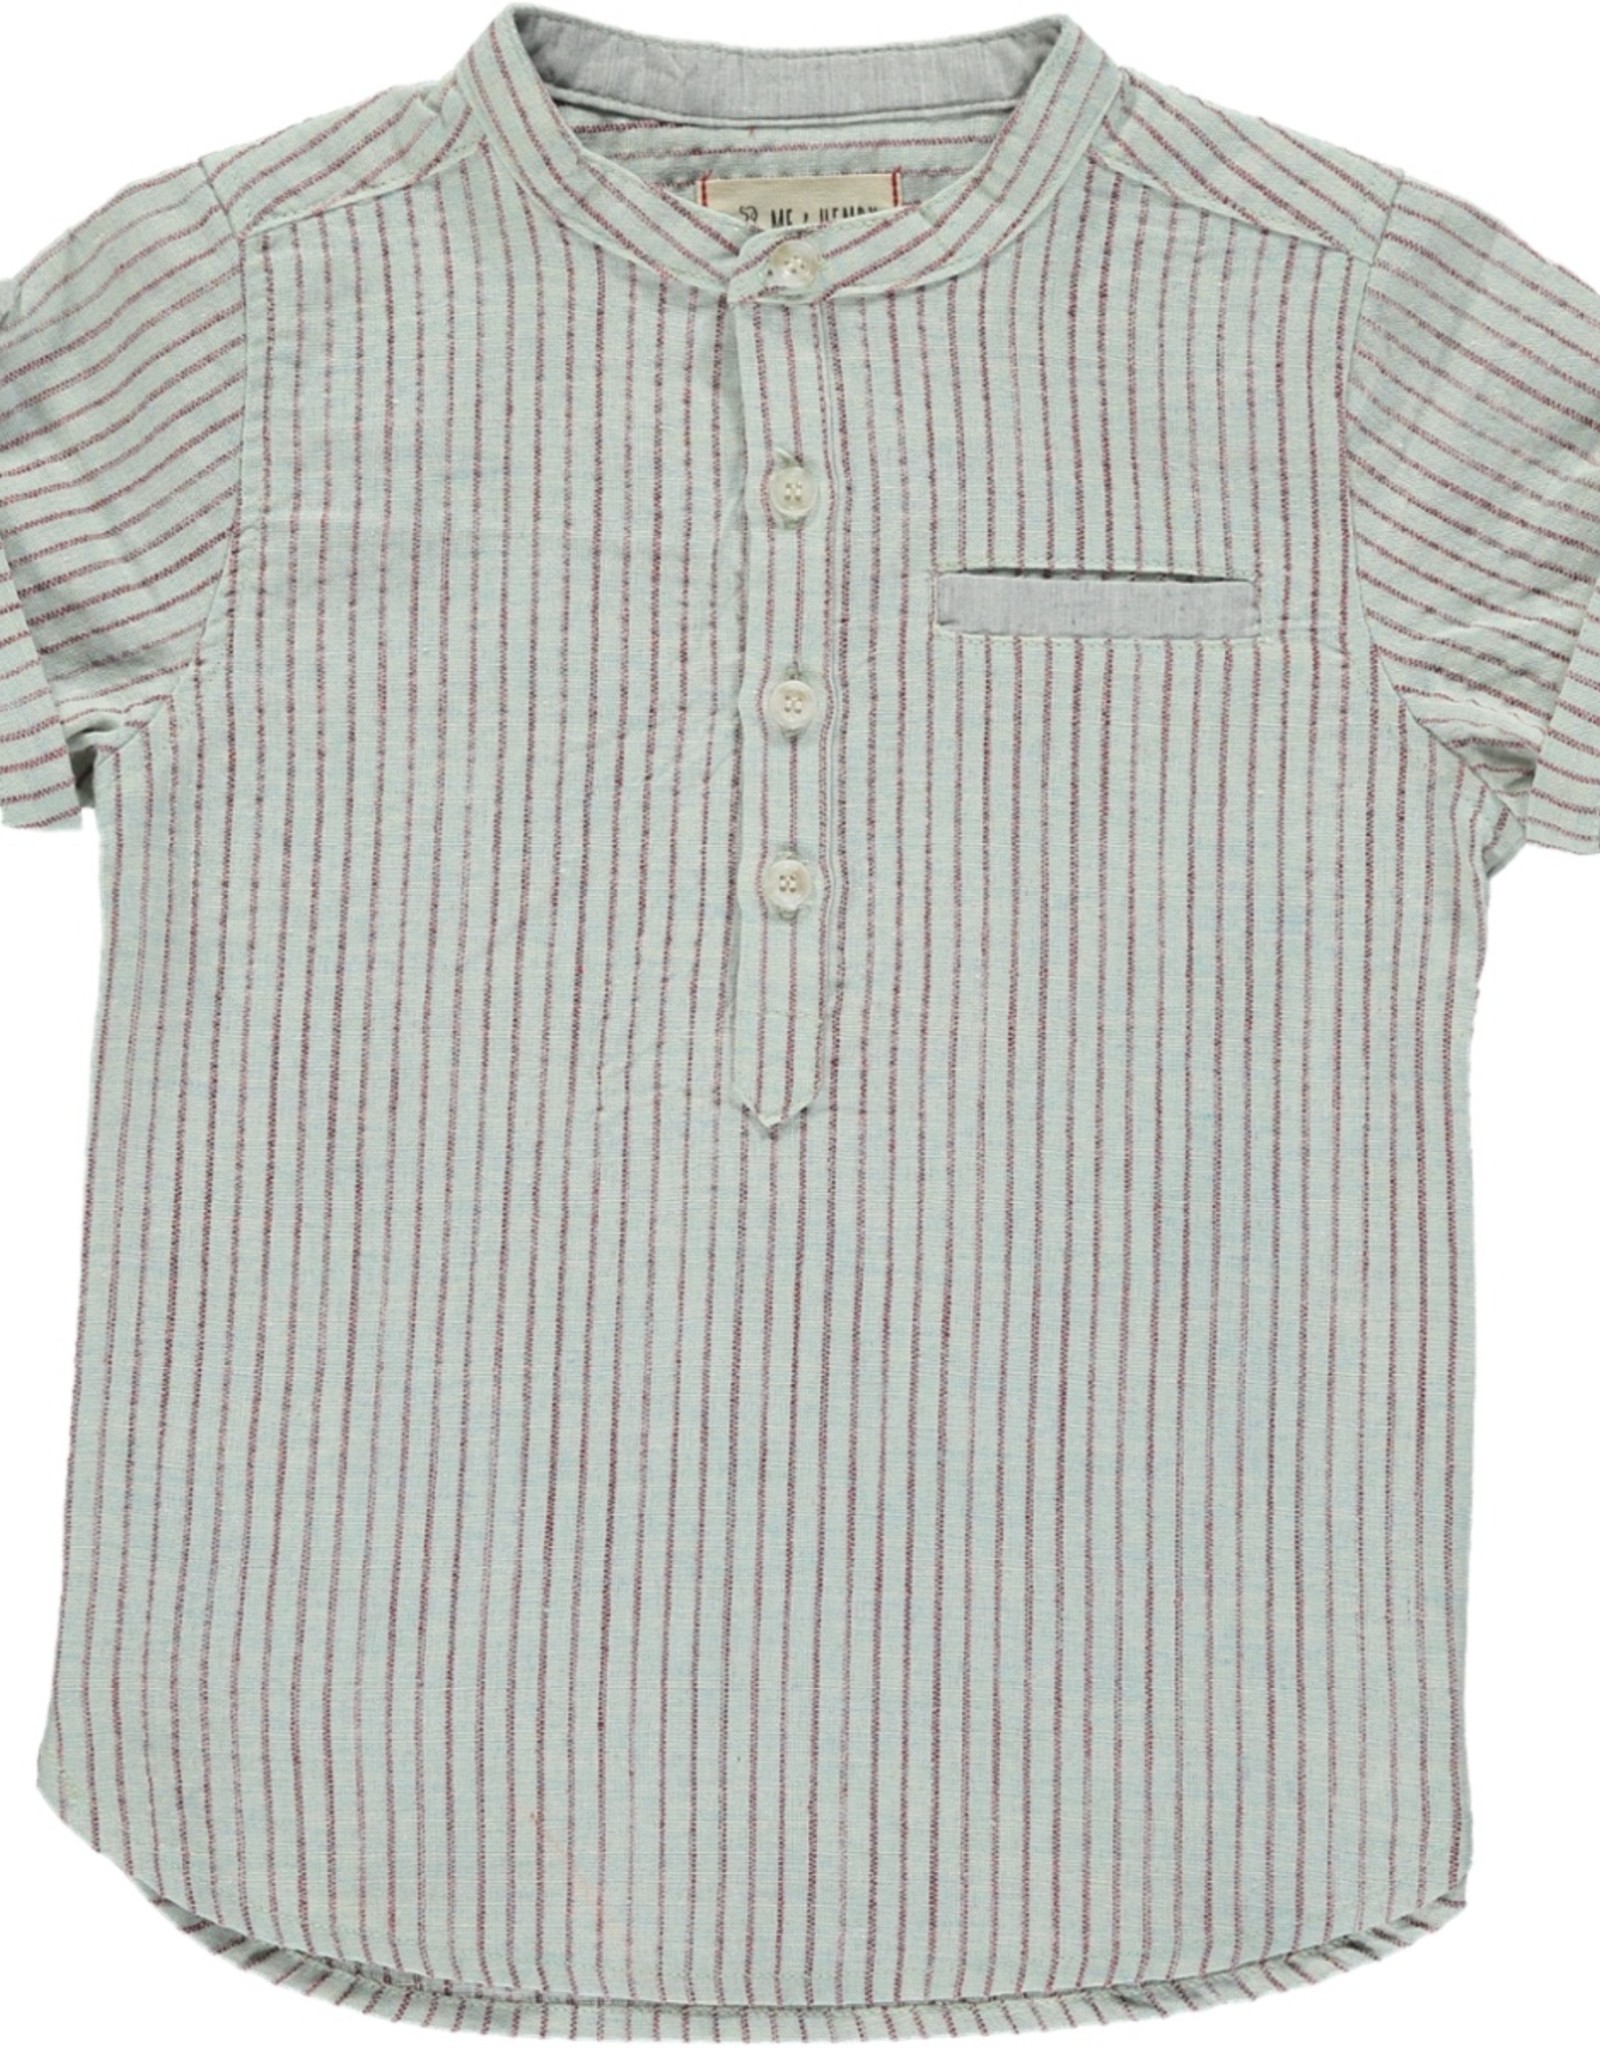 Aqua/red stripe round neck s/s shirt